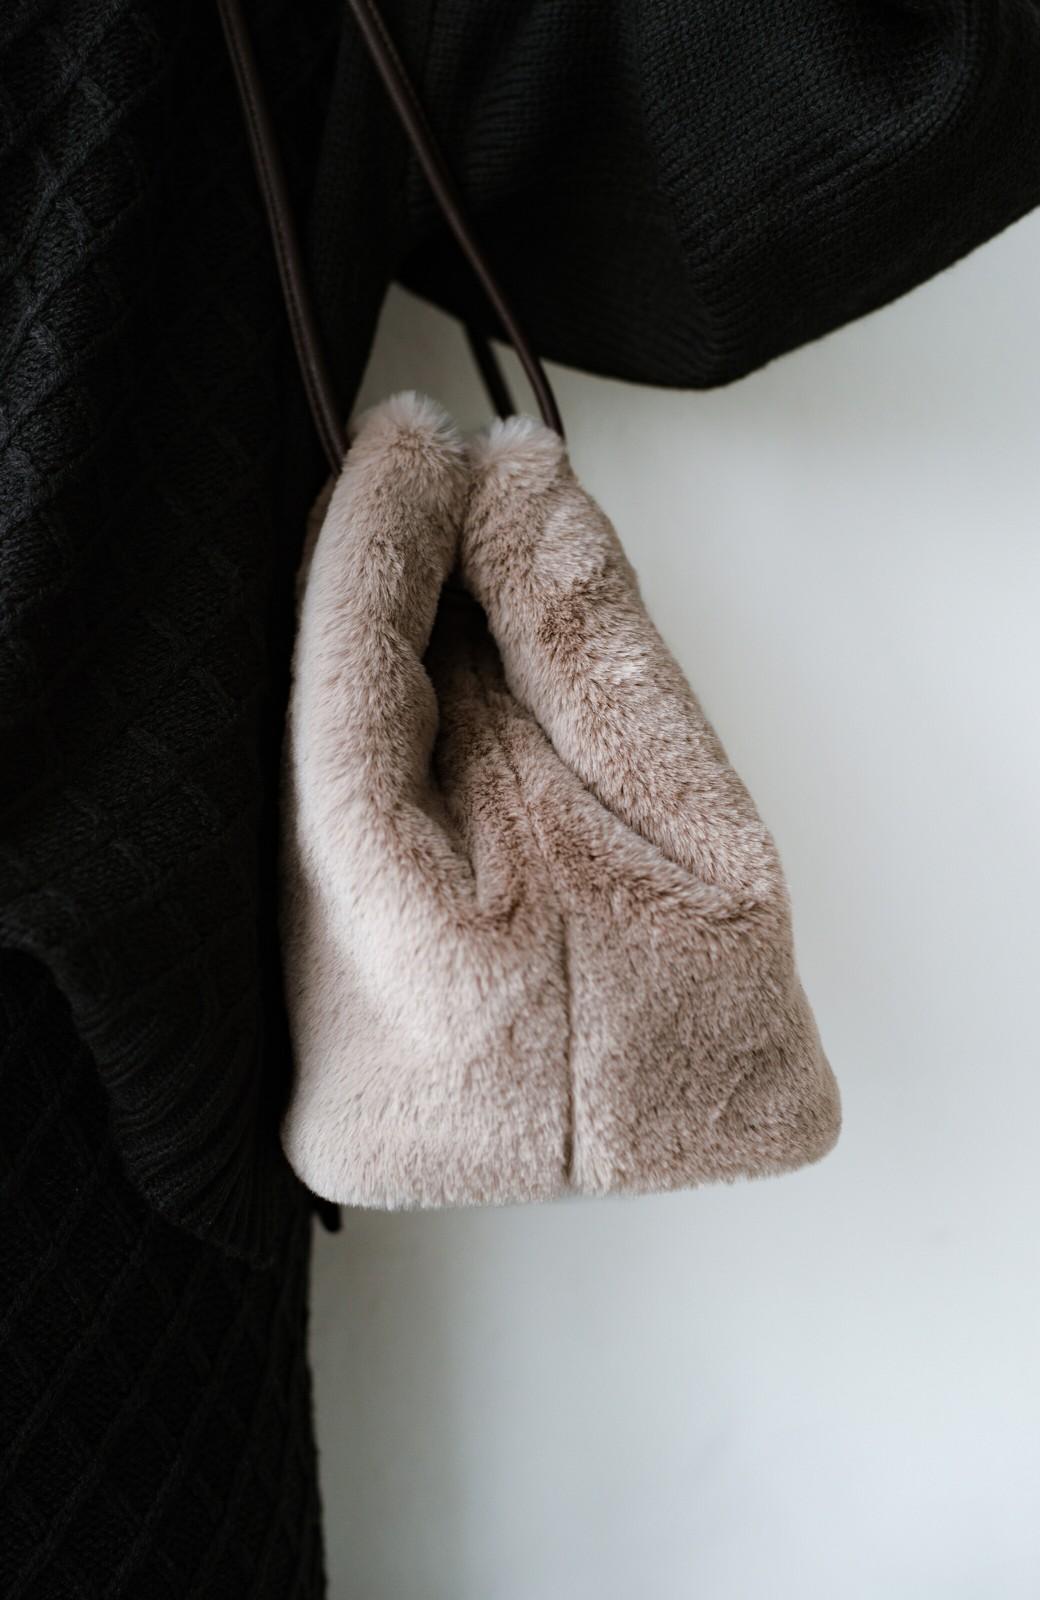 haco! さっと持って気分が上がる ふわっとかわいいエコファー巾着バッグ <グレイッシュベージュ>の商品写真8